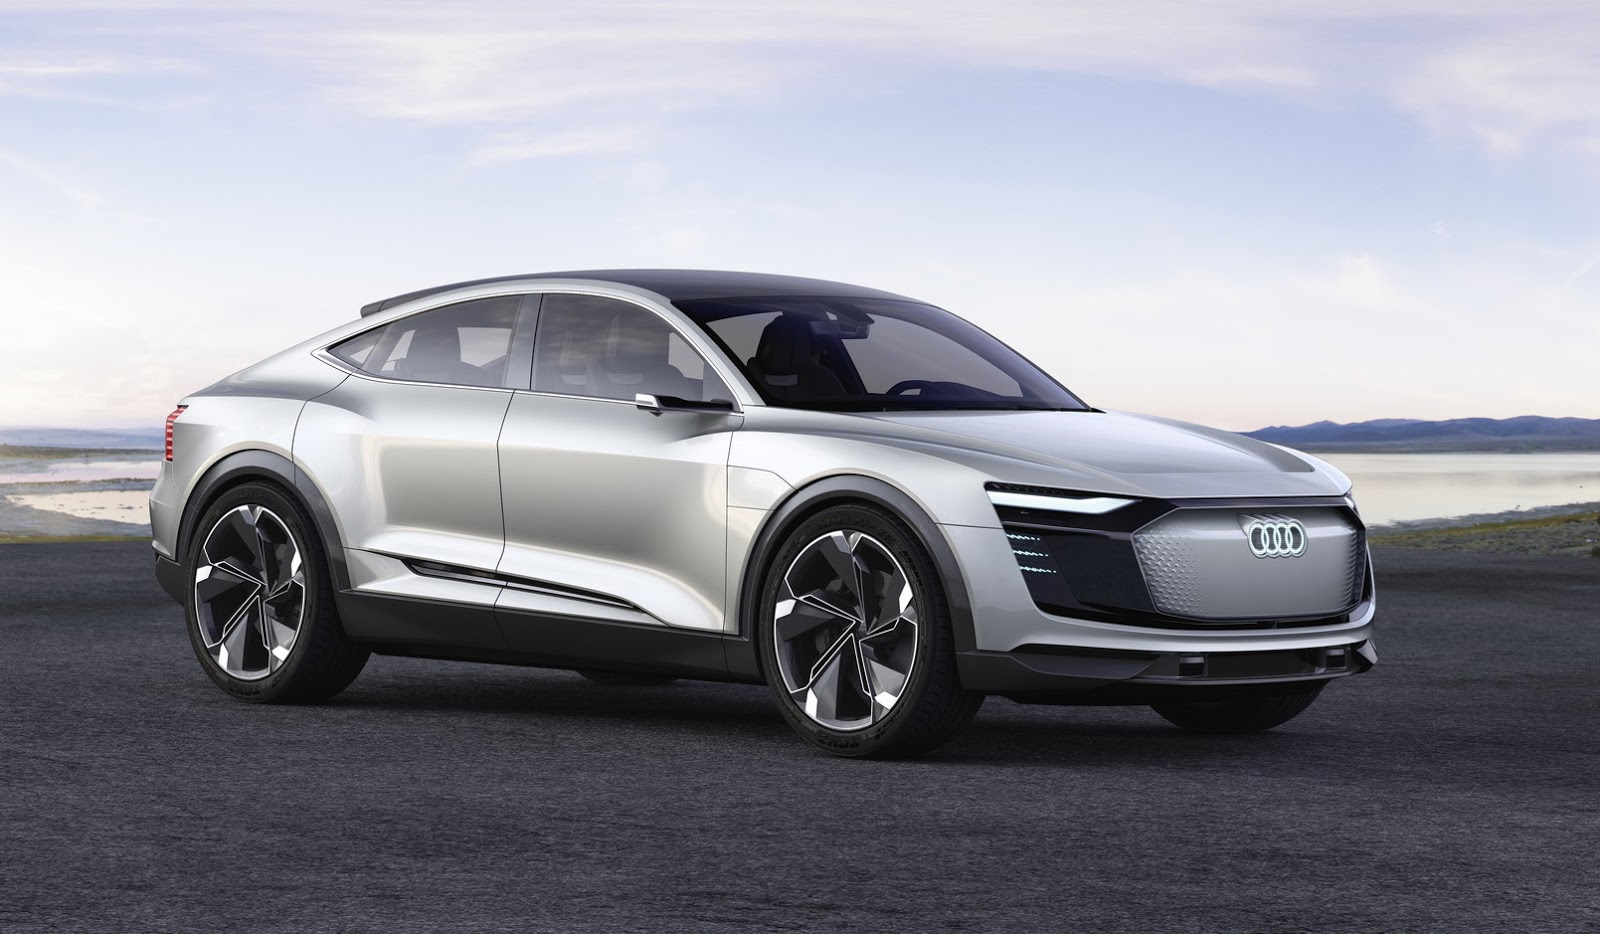 Ауди готовит конкурента бюджетному электрокару Tesla Model 3